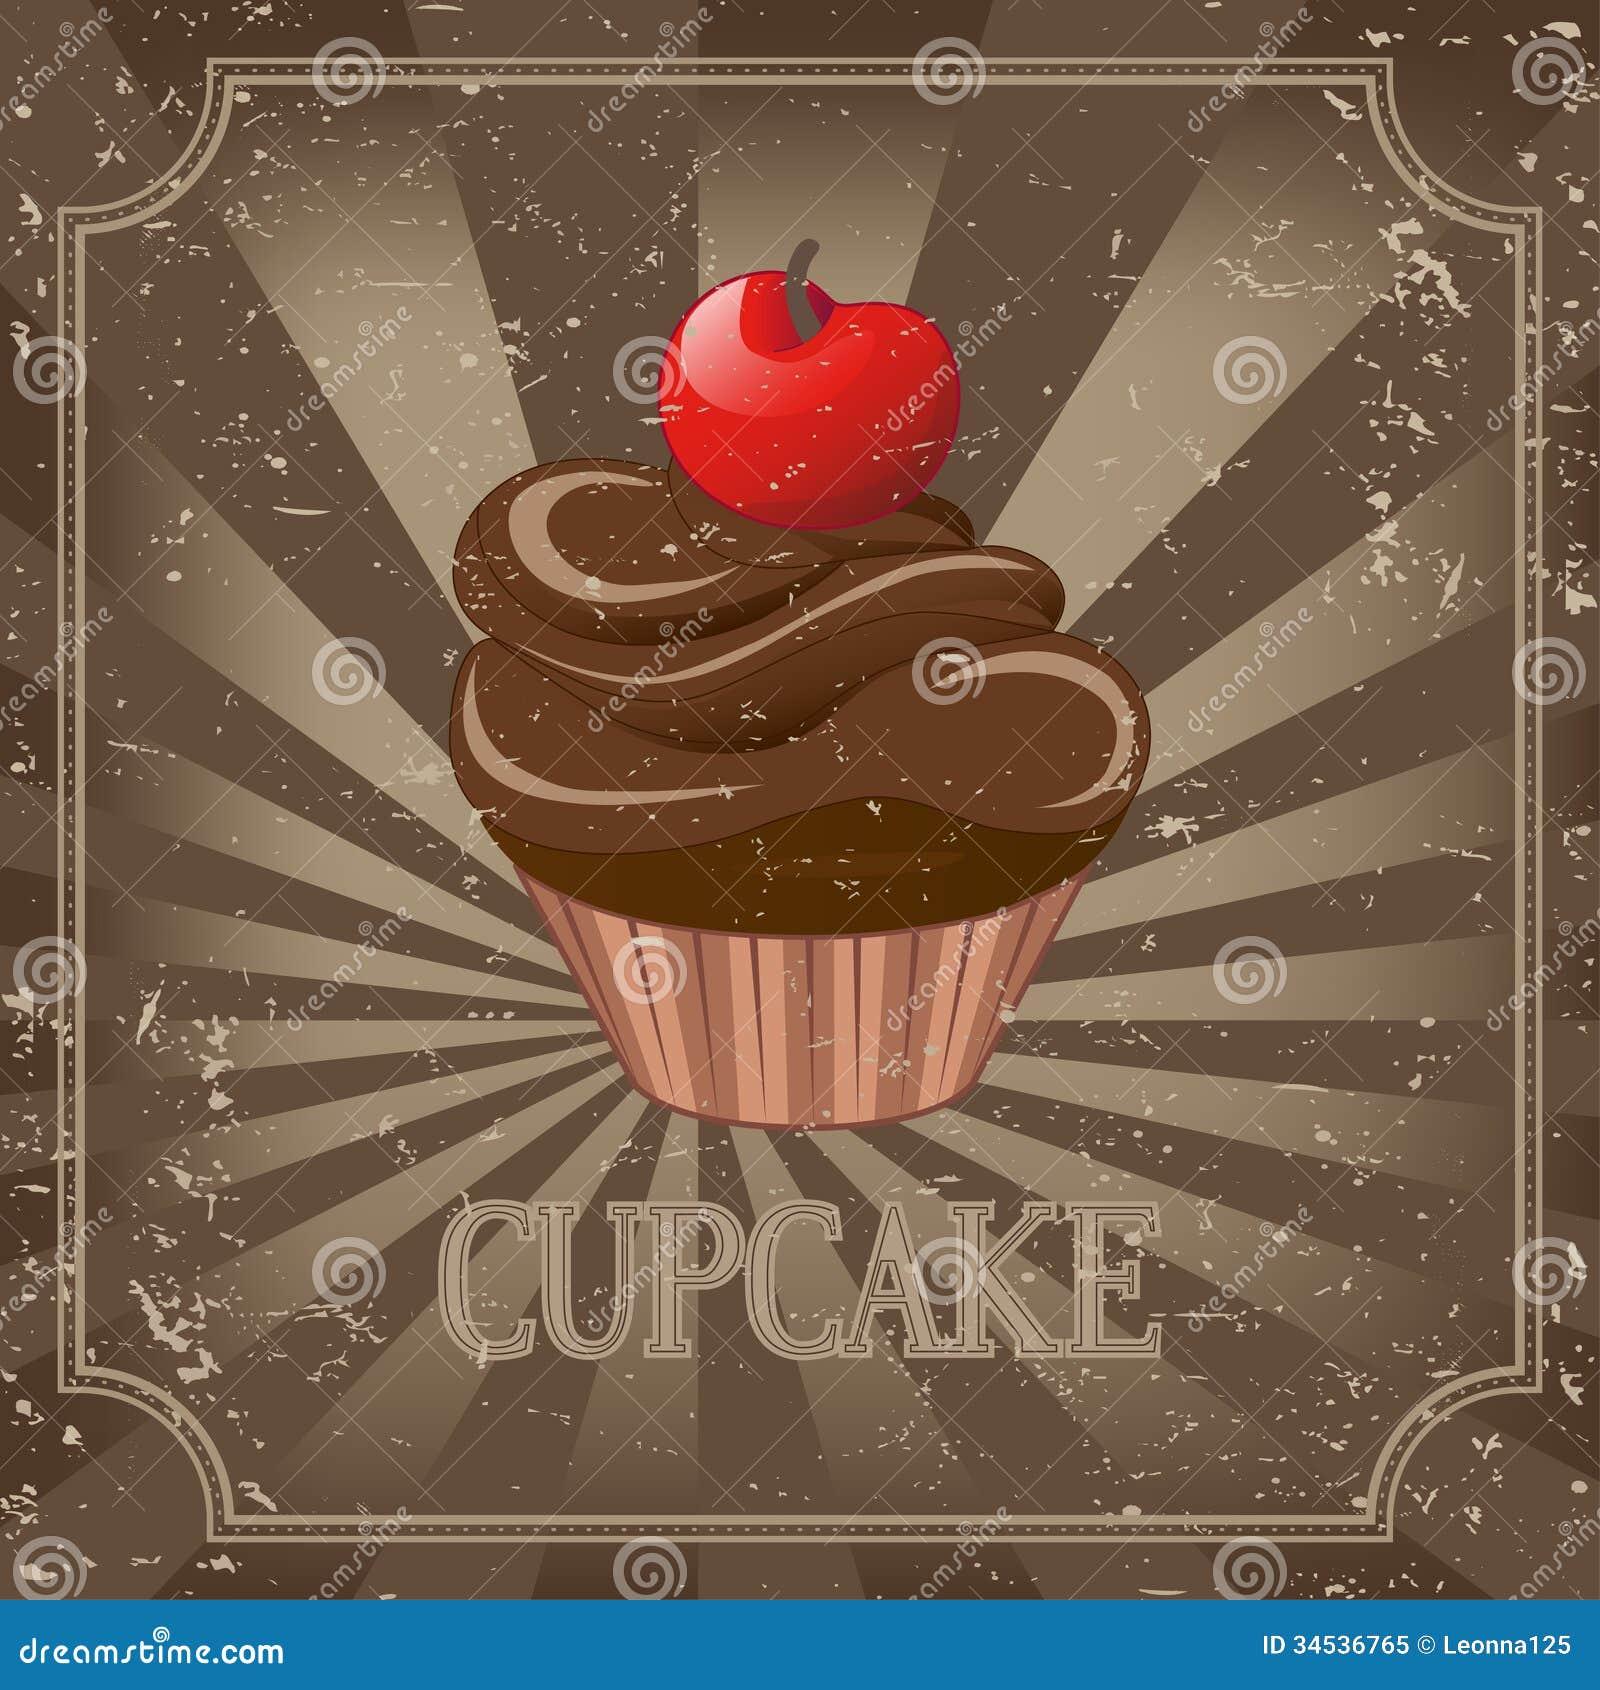 cupcake on vintage background